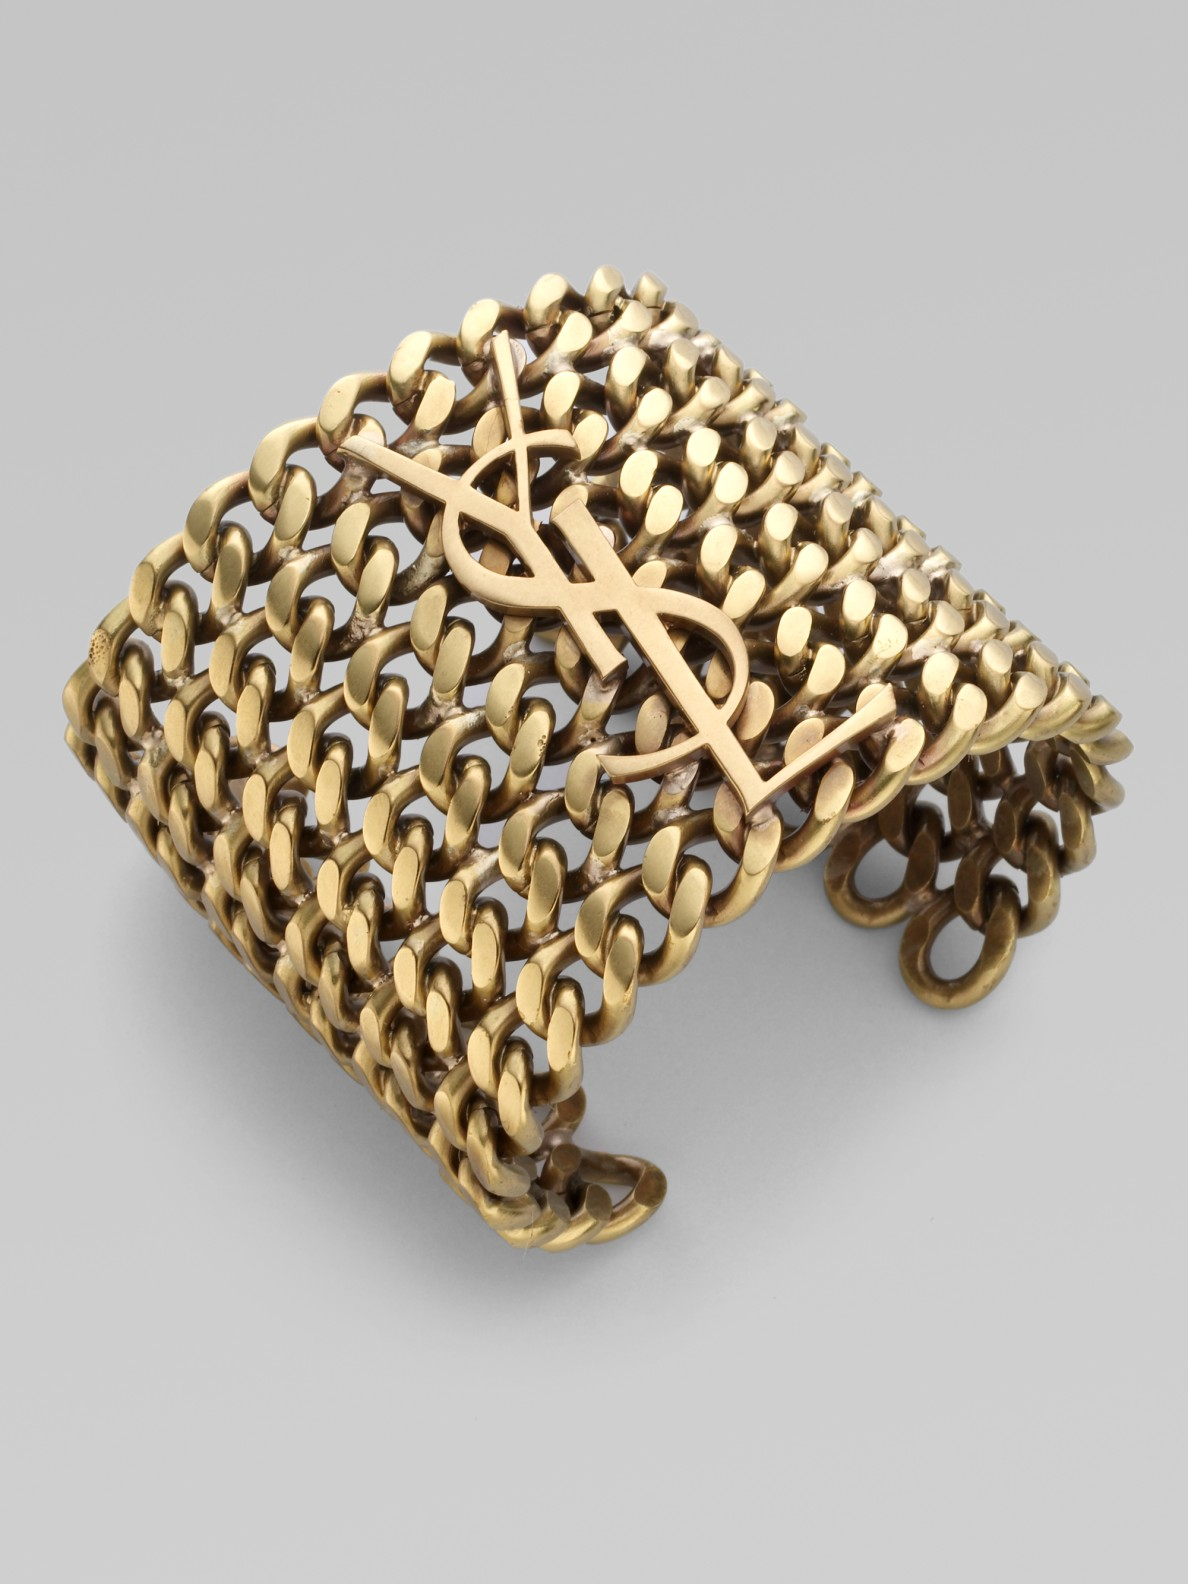 saint laurent signature structured chain cuff bracelet in gold lyst. Black Bedroom Furniture Sets. Home Design Ideas